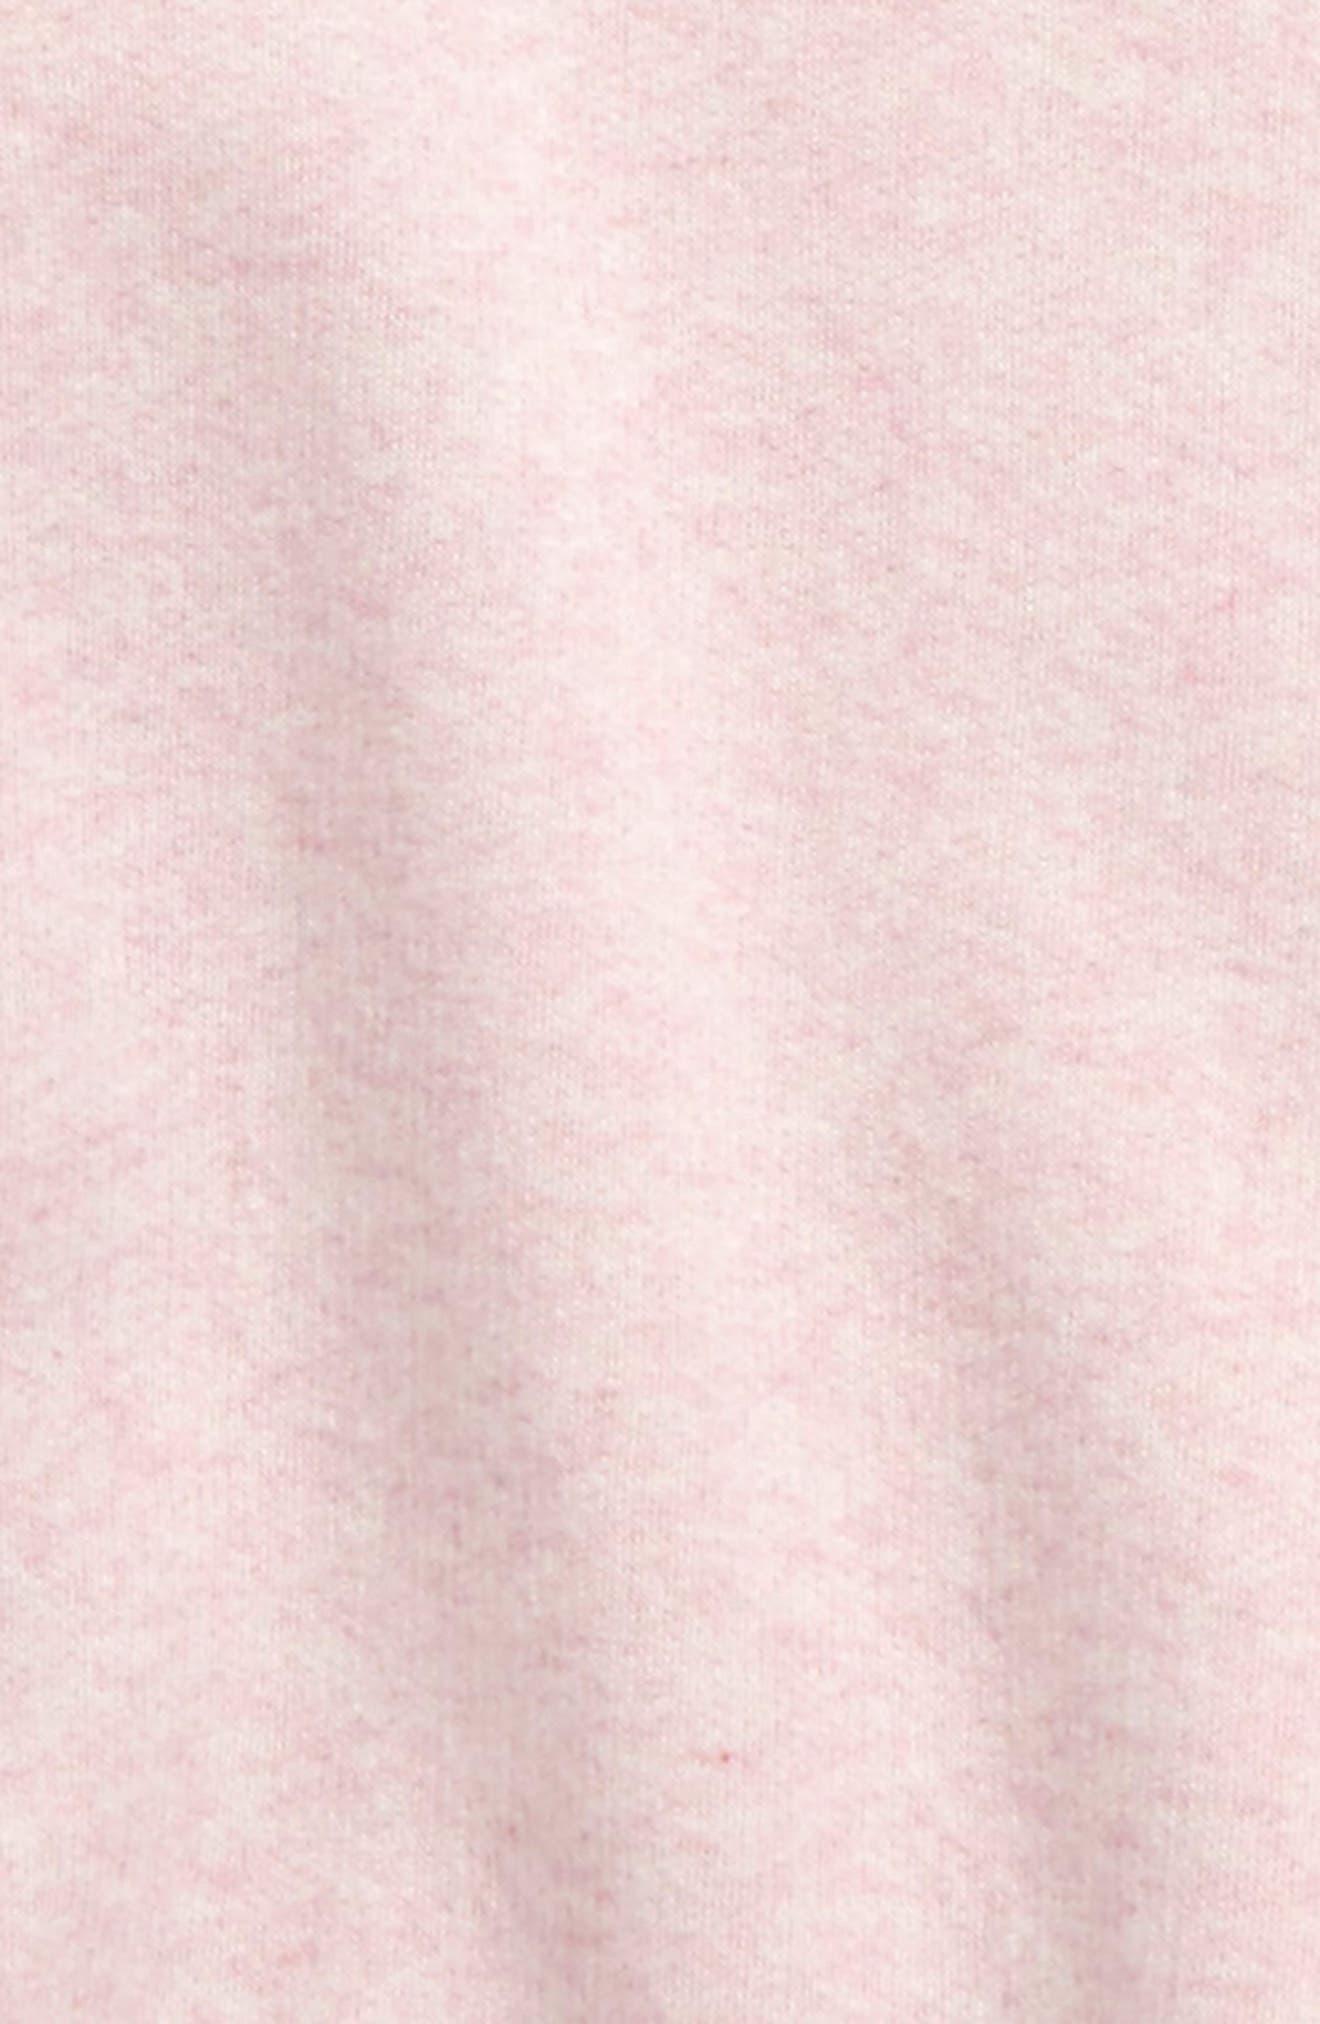 Ruffle Fleece Sweatshirt,                             Alternate thumbnail 2, color,                             PINK BREATH HEATHER